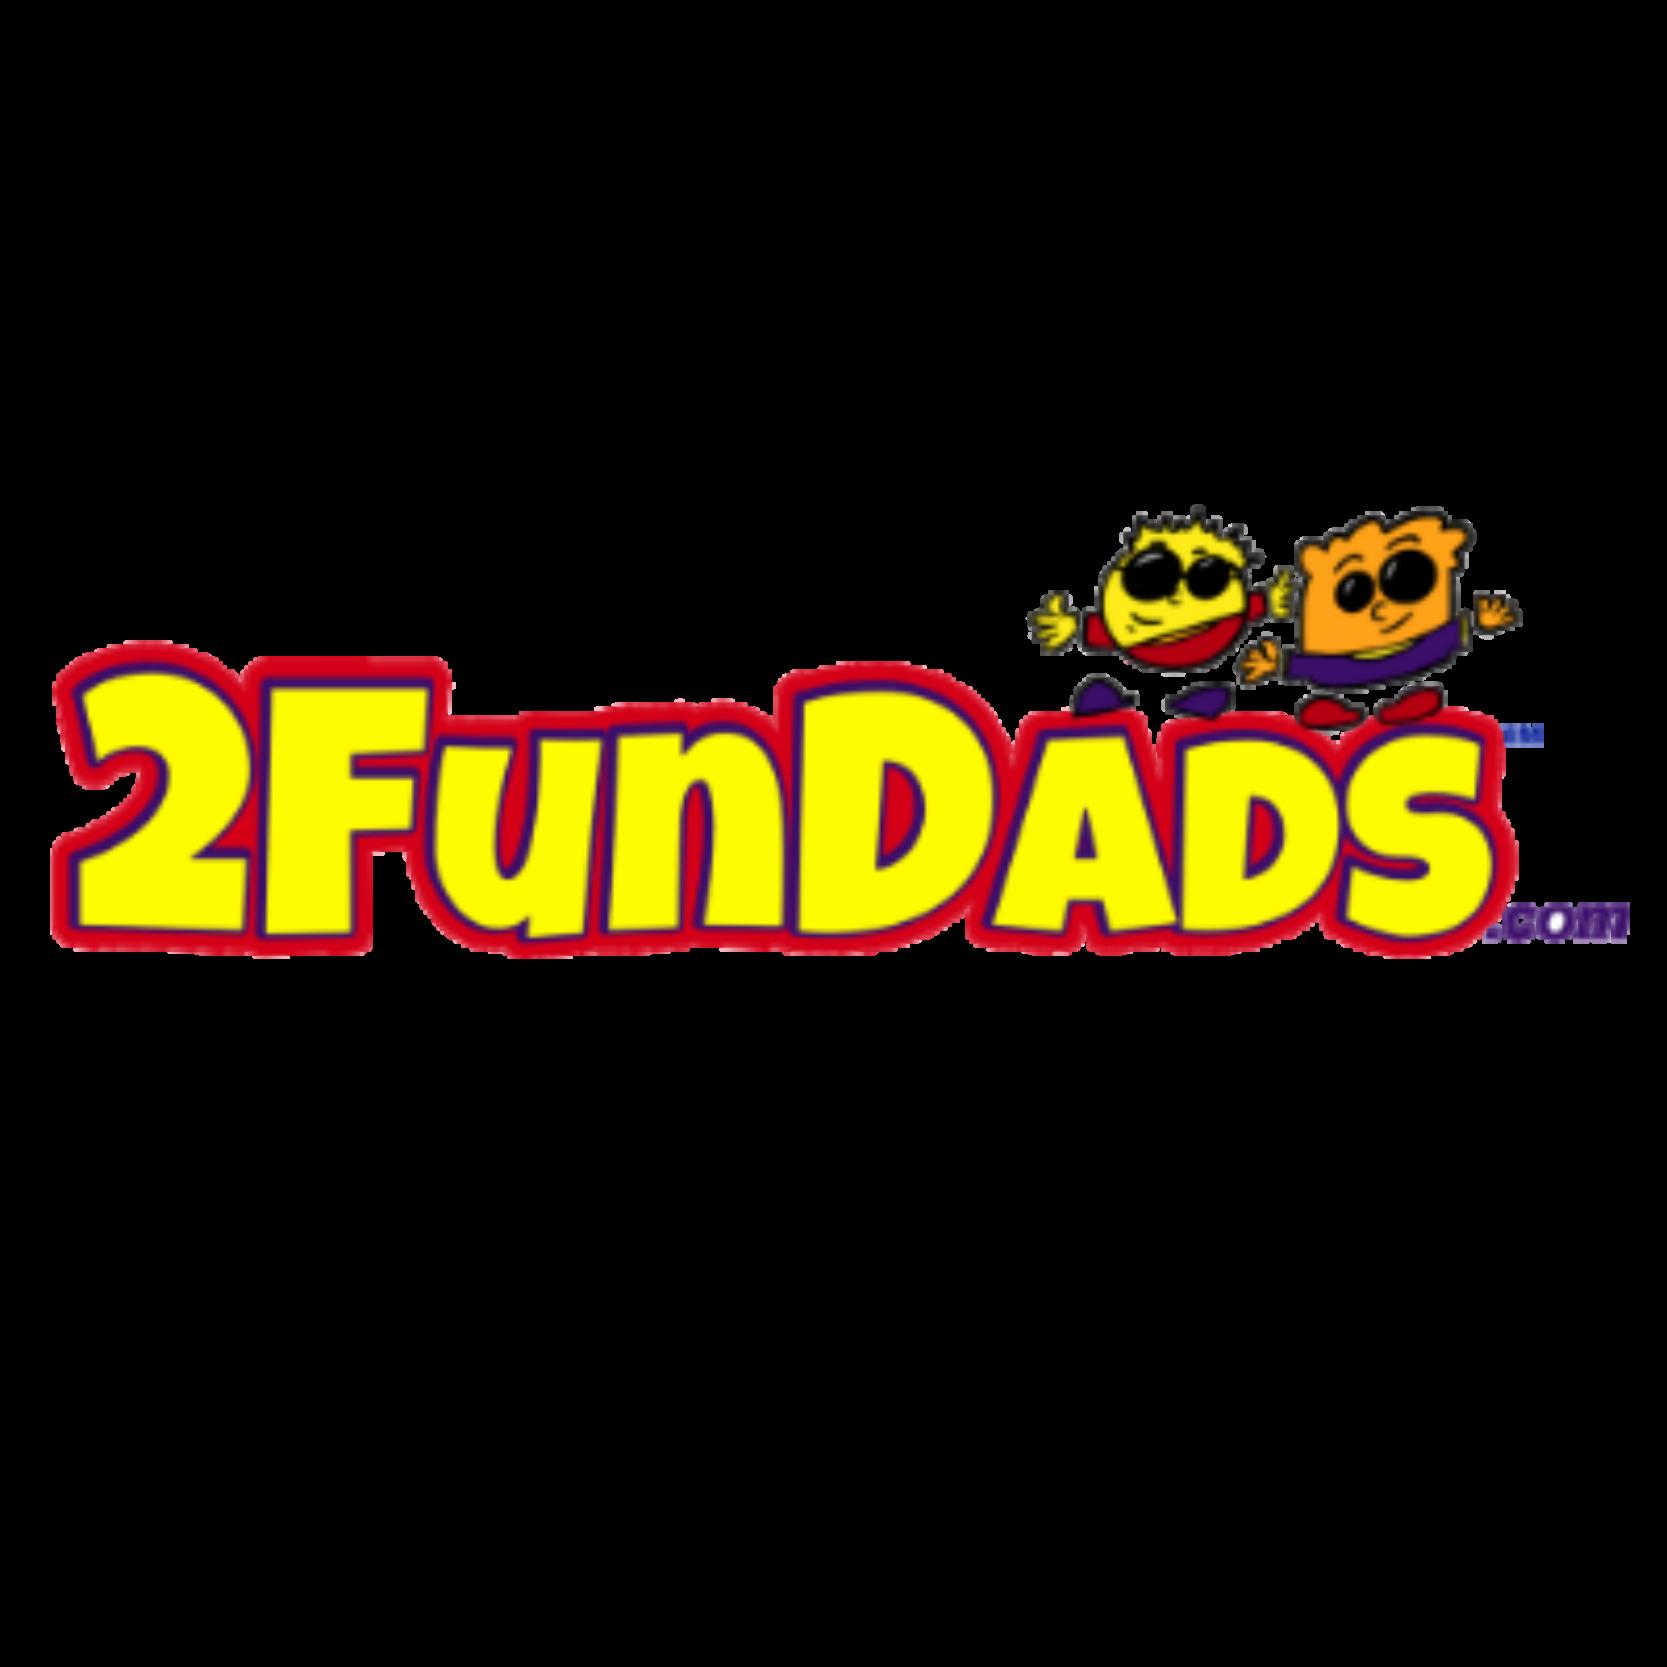 2FunDads messages sticker-0